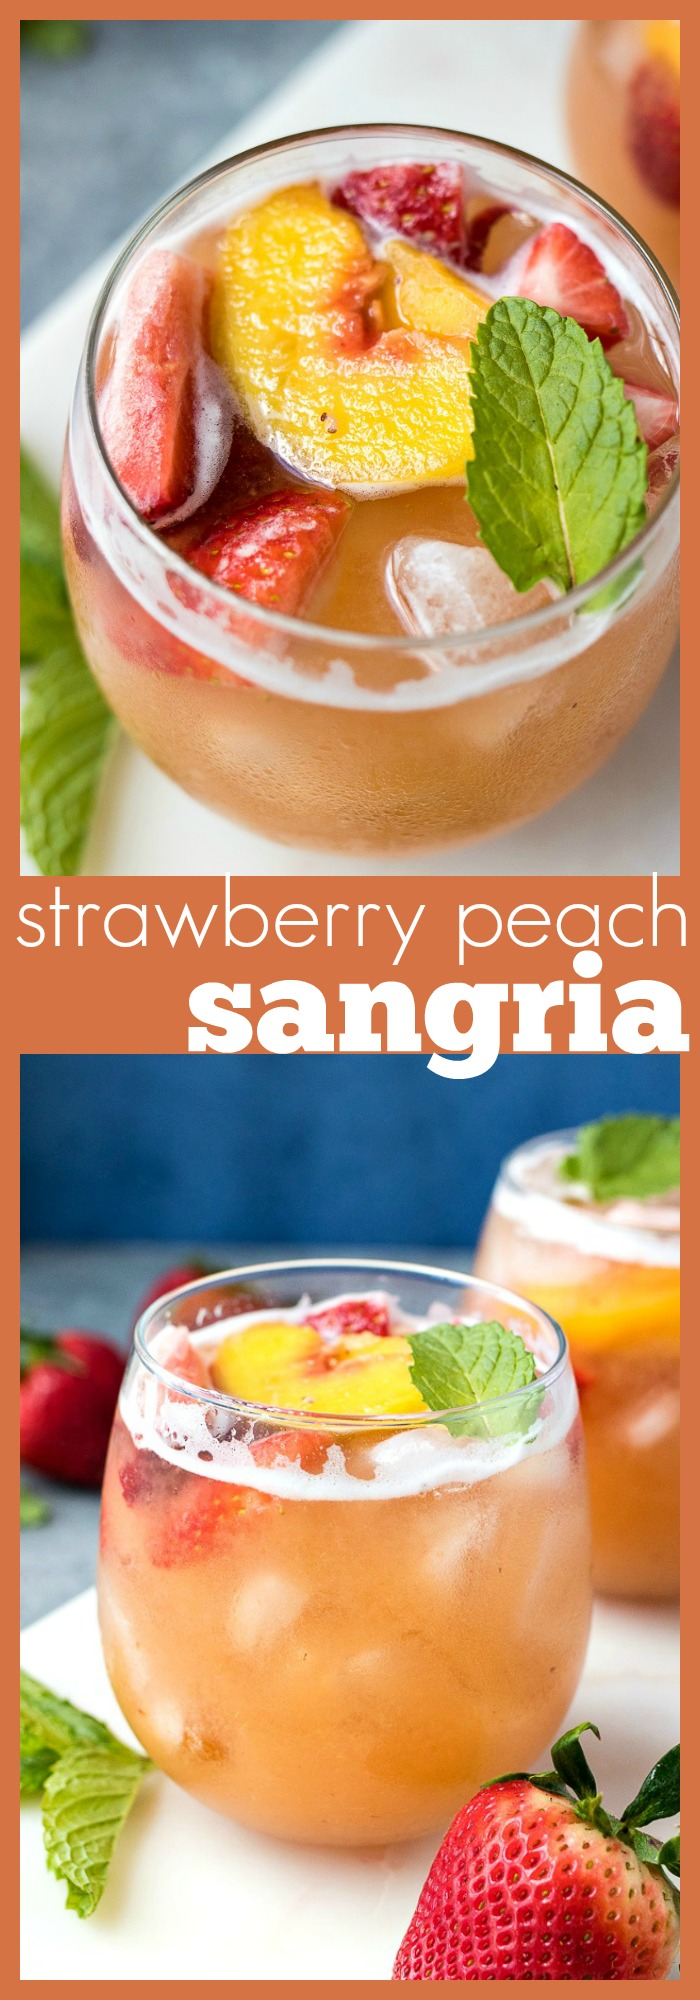 Strawberry Peach Sangria photo collage